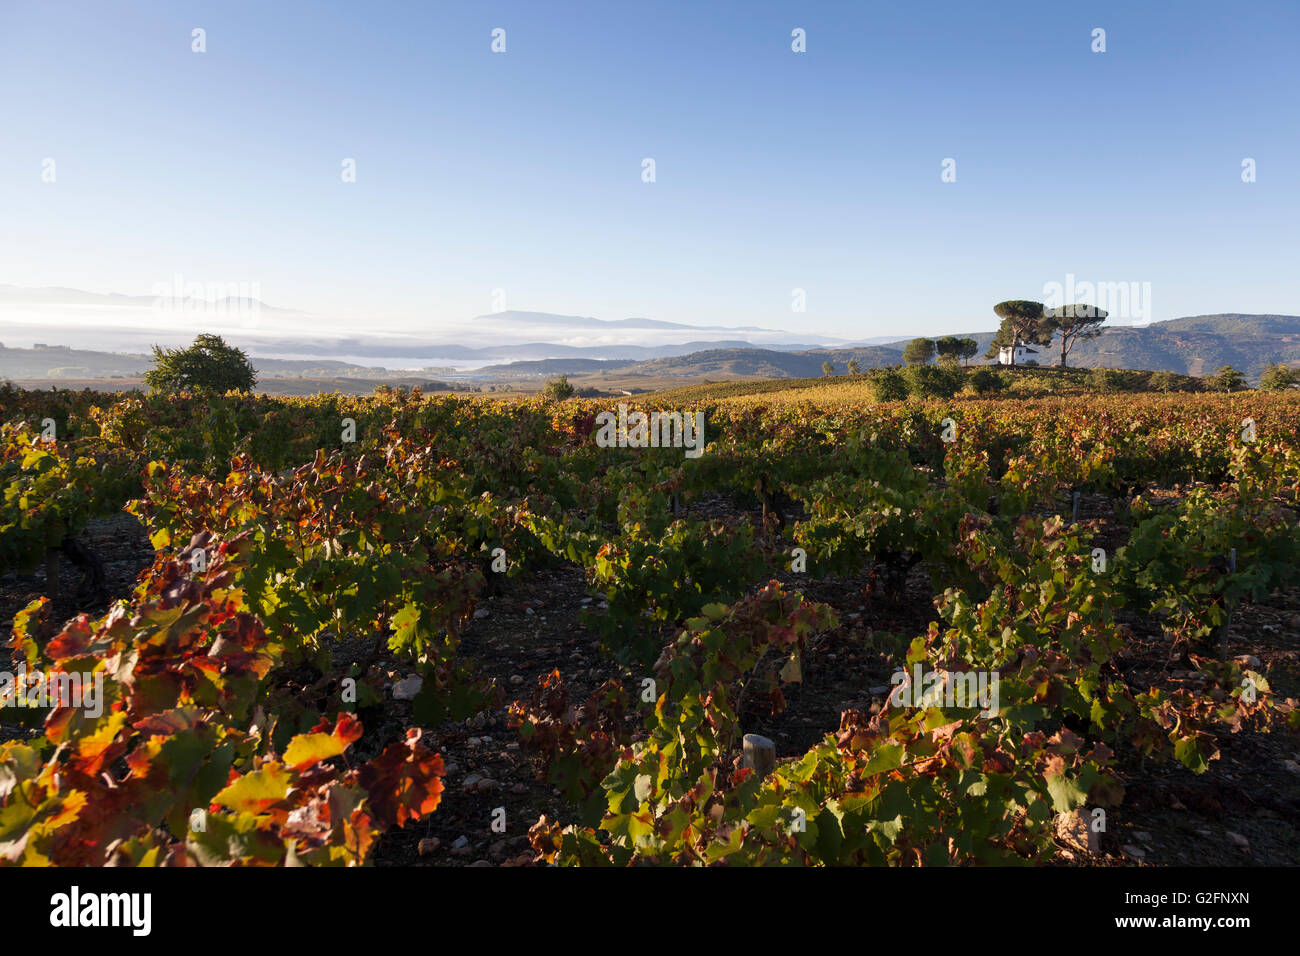 Villafranca del Bierzo, Spain: Idyllic white home with vineyards along the Camino Francés. - Stock Image